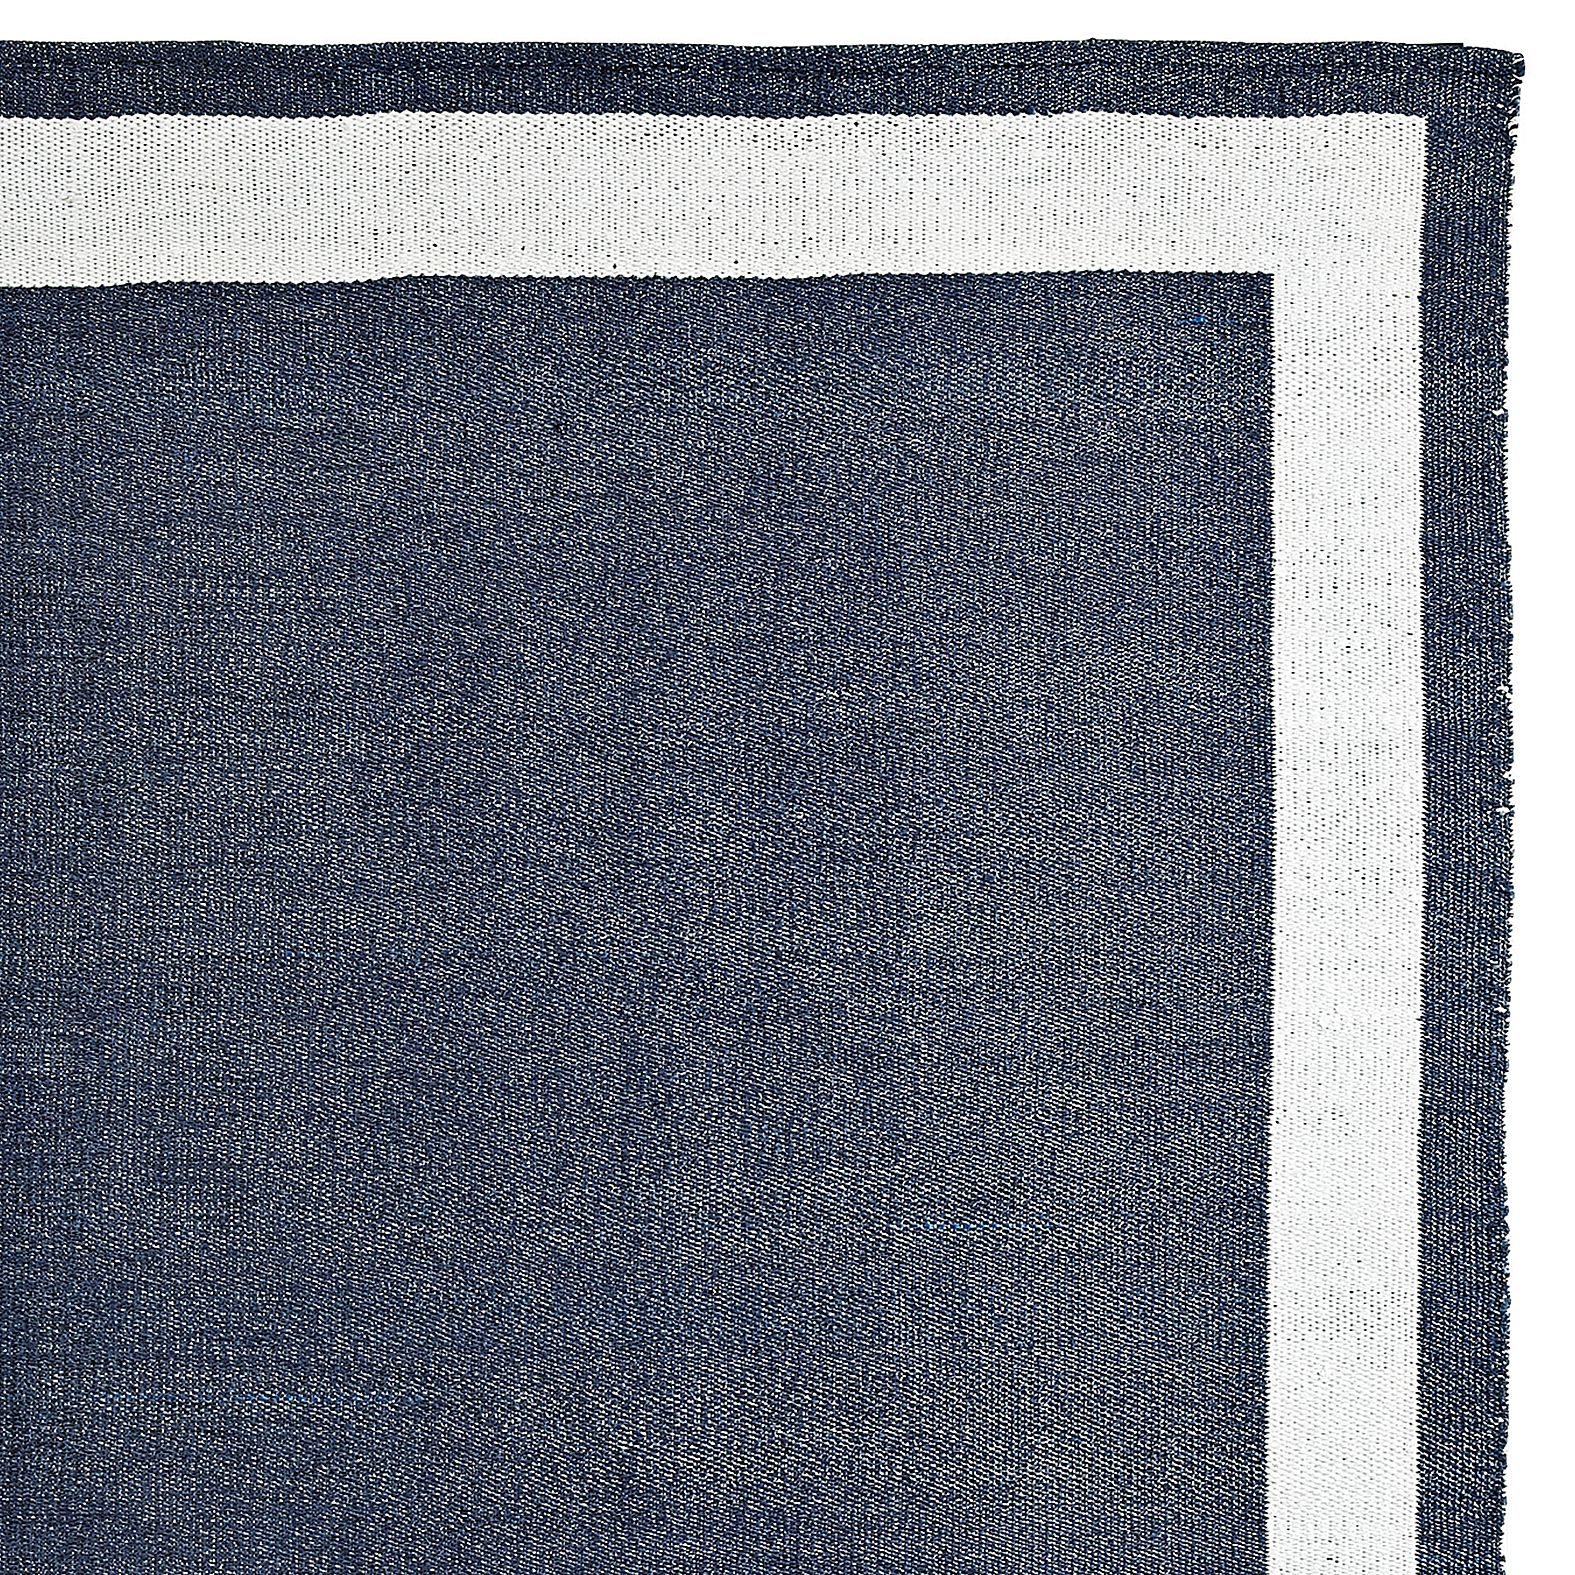 Outdoor border rug navywhite serena lily navy rug